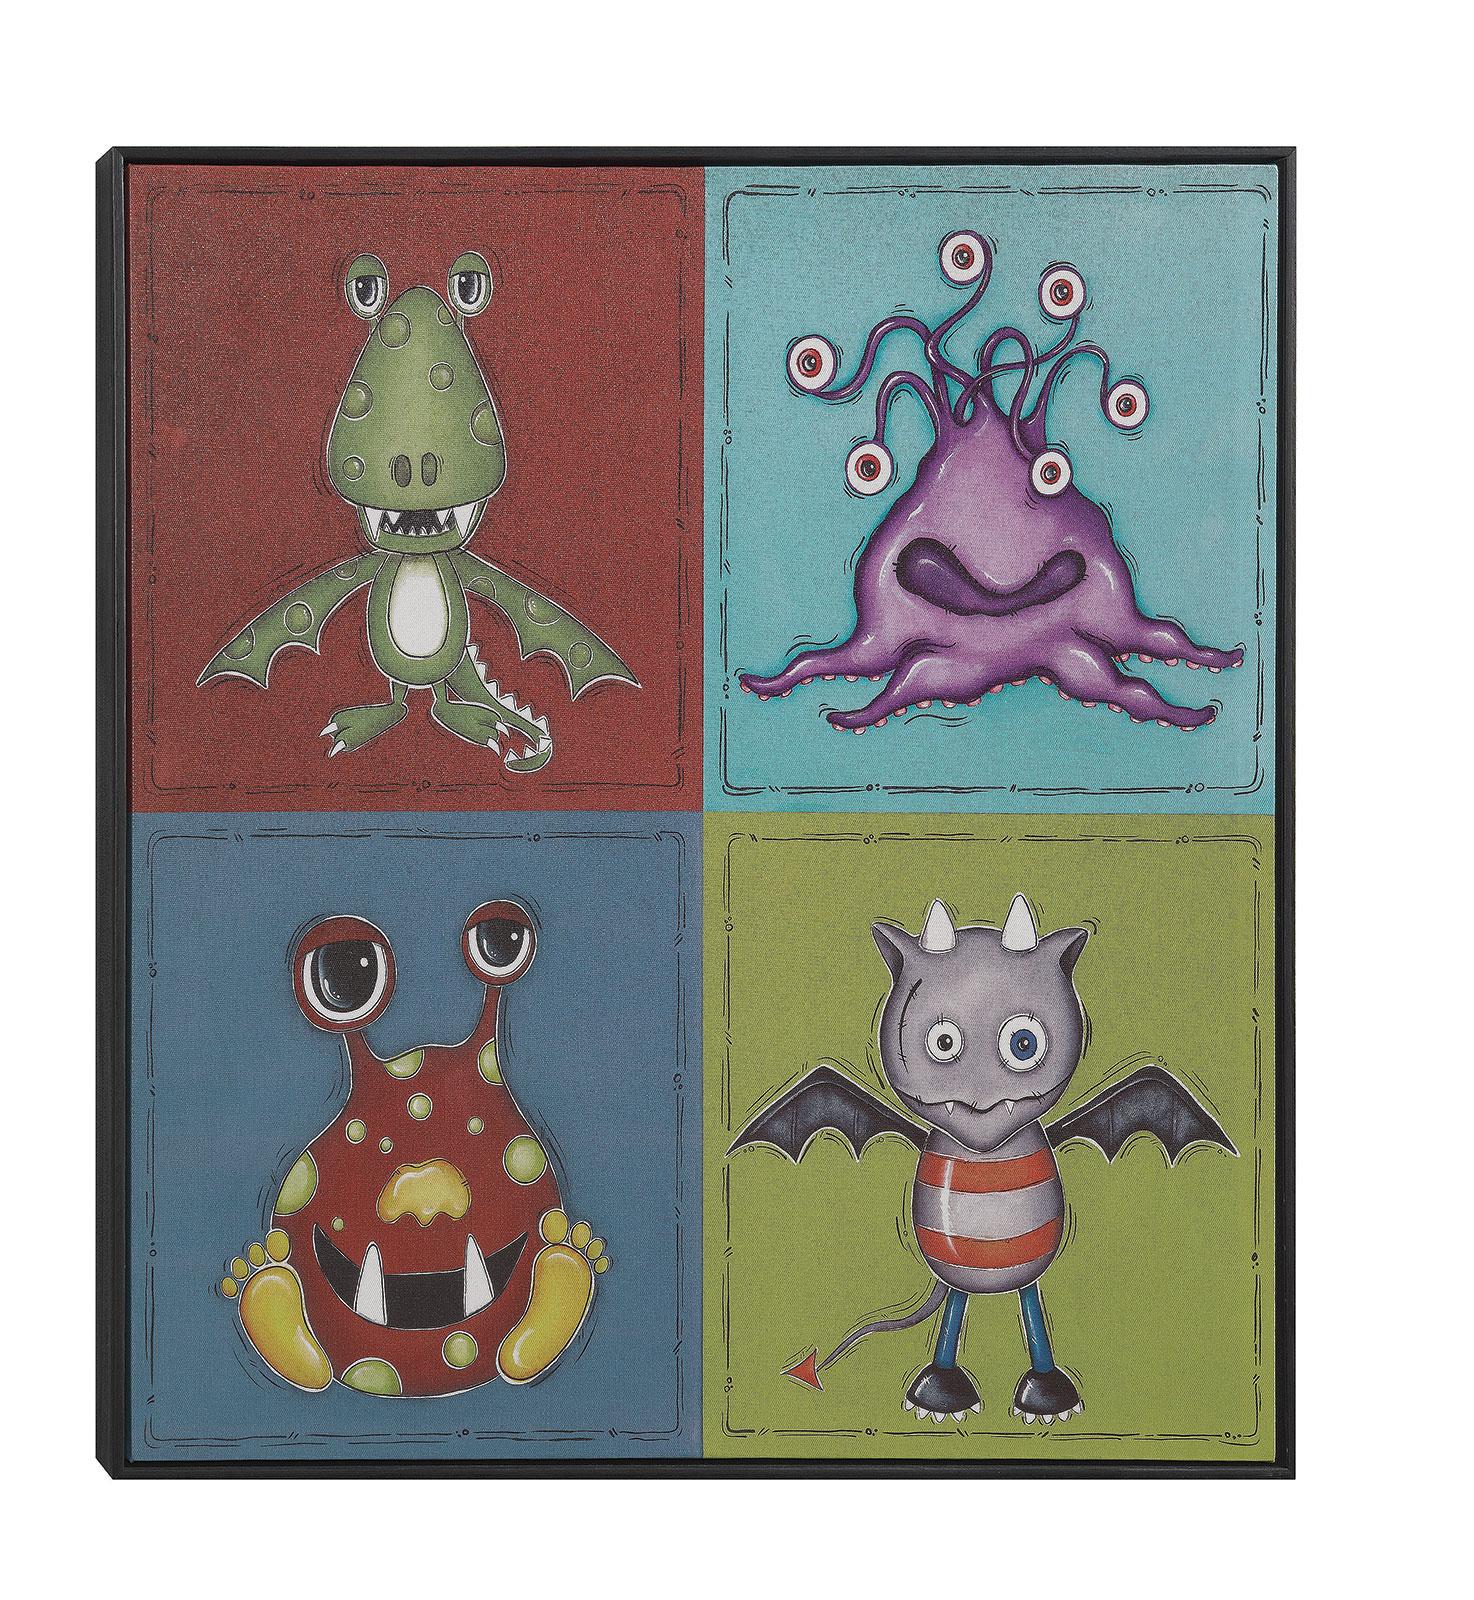 Coaster Wall Art Art - Item Number: 961027